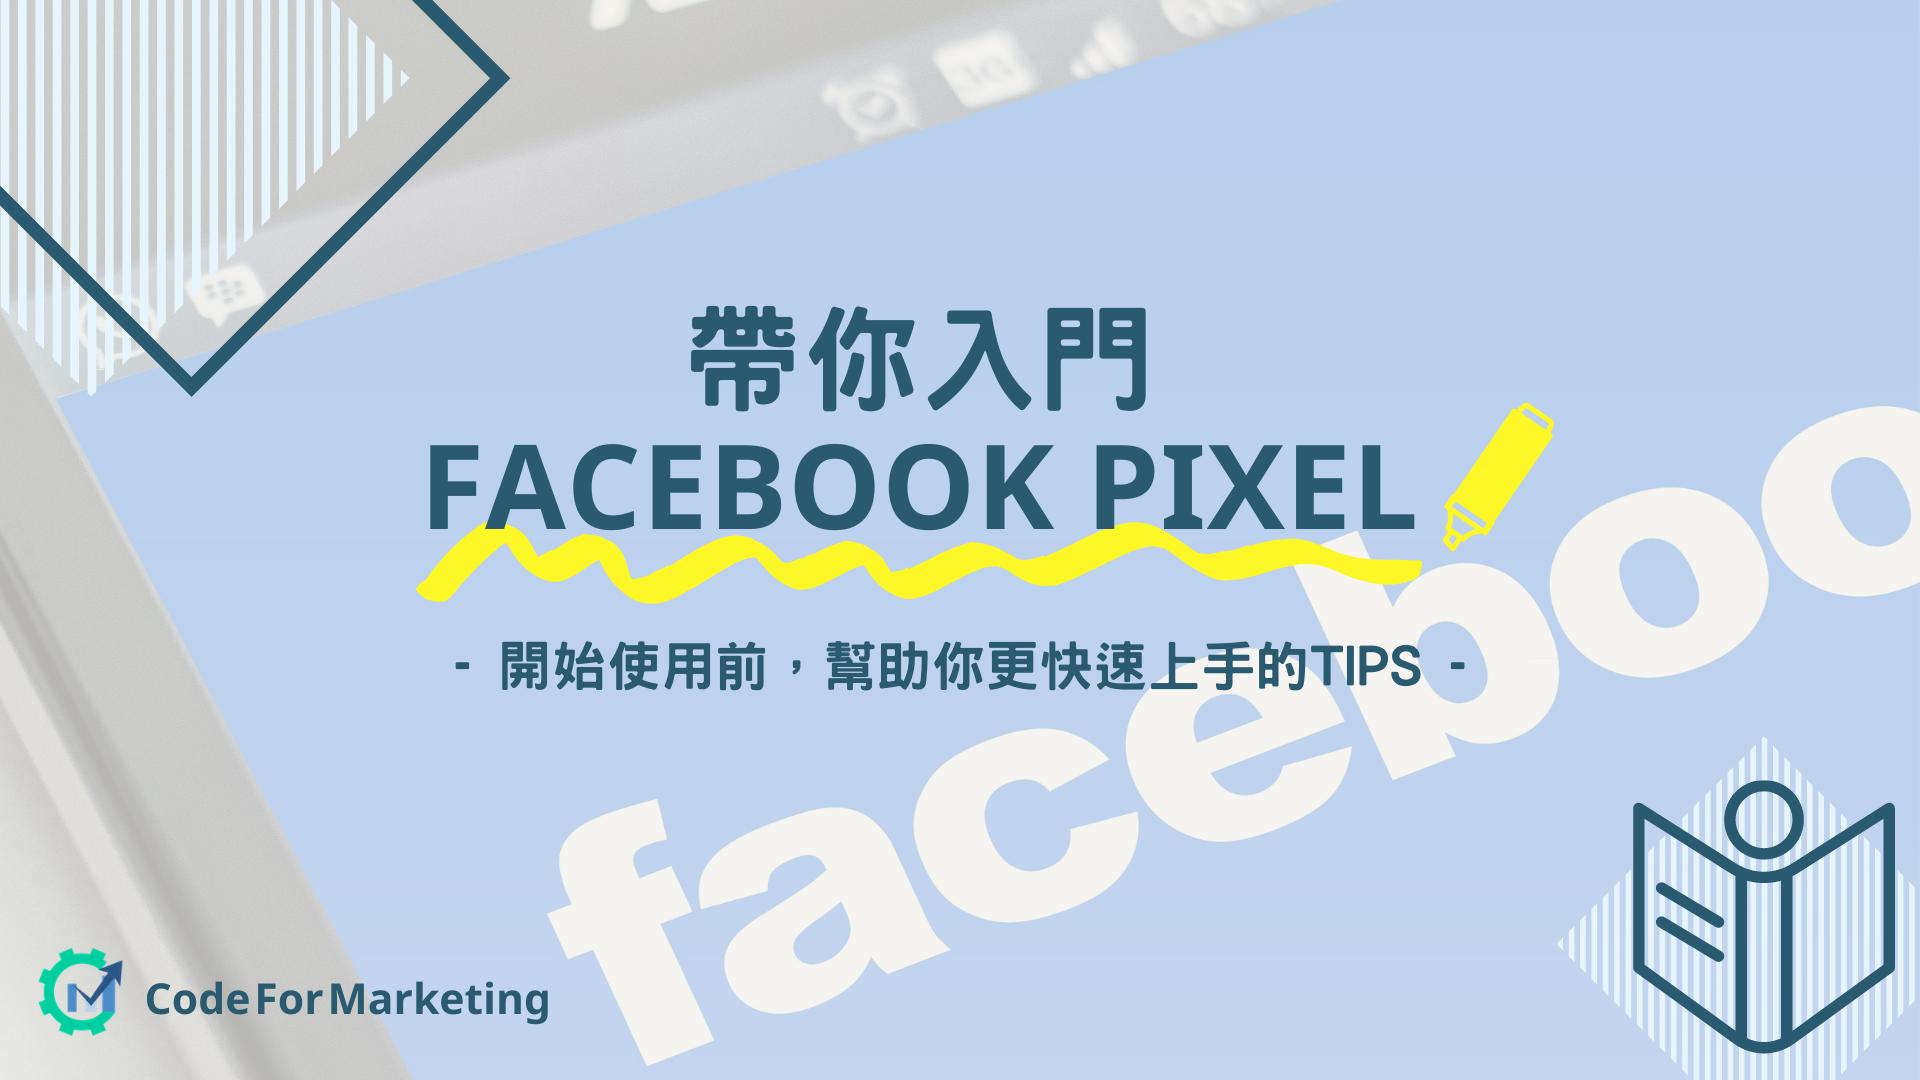 Protected: 帶你入門Facebook Pixel:開始使用前,幫助你更快速上手的Tips !